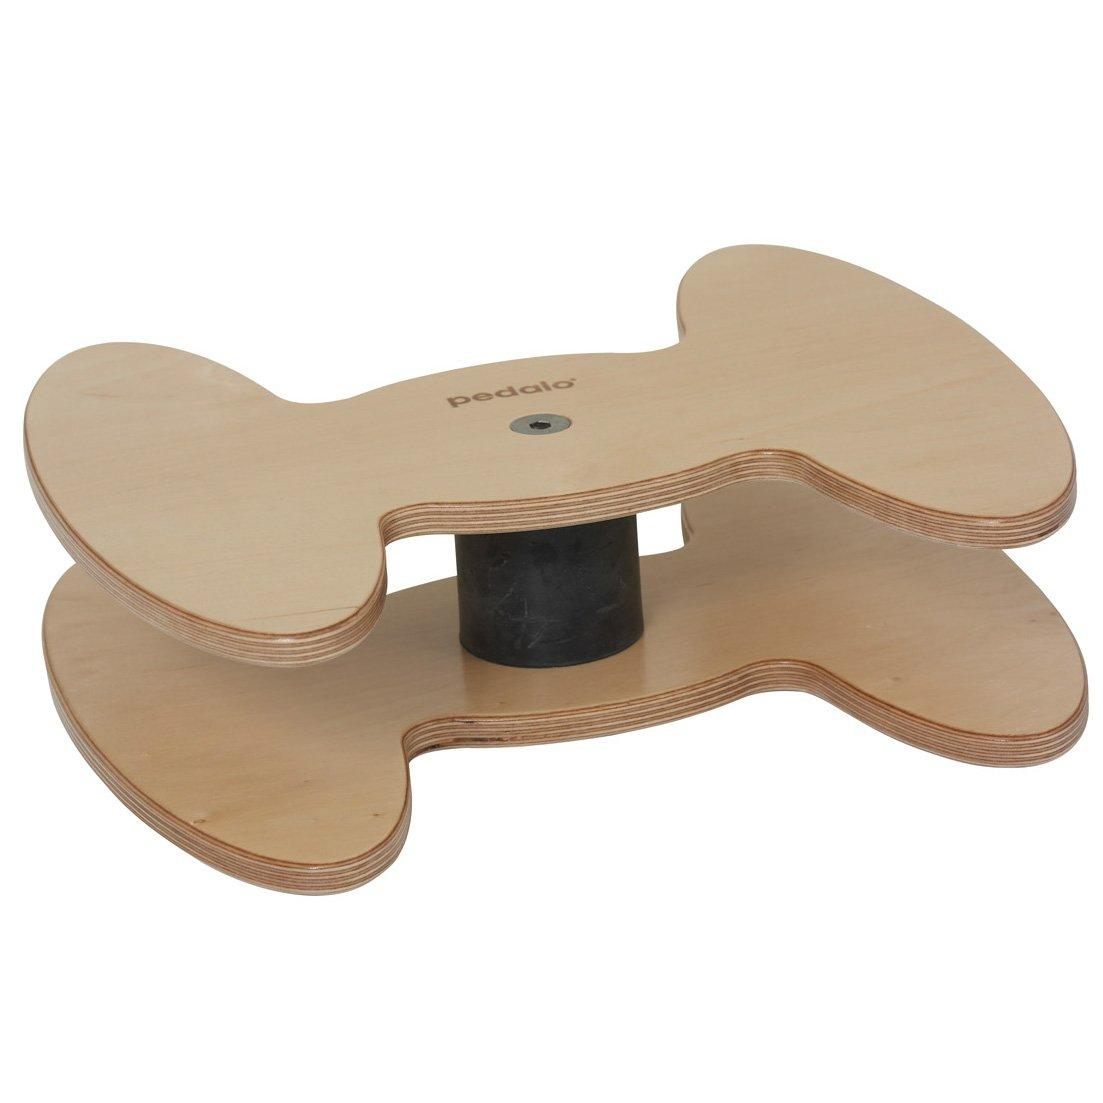 Pedalo Performer I Gleichgewichtstrainer I Balance Board I Balancekreisel I Koordination I Therapiekreisel I Fitness